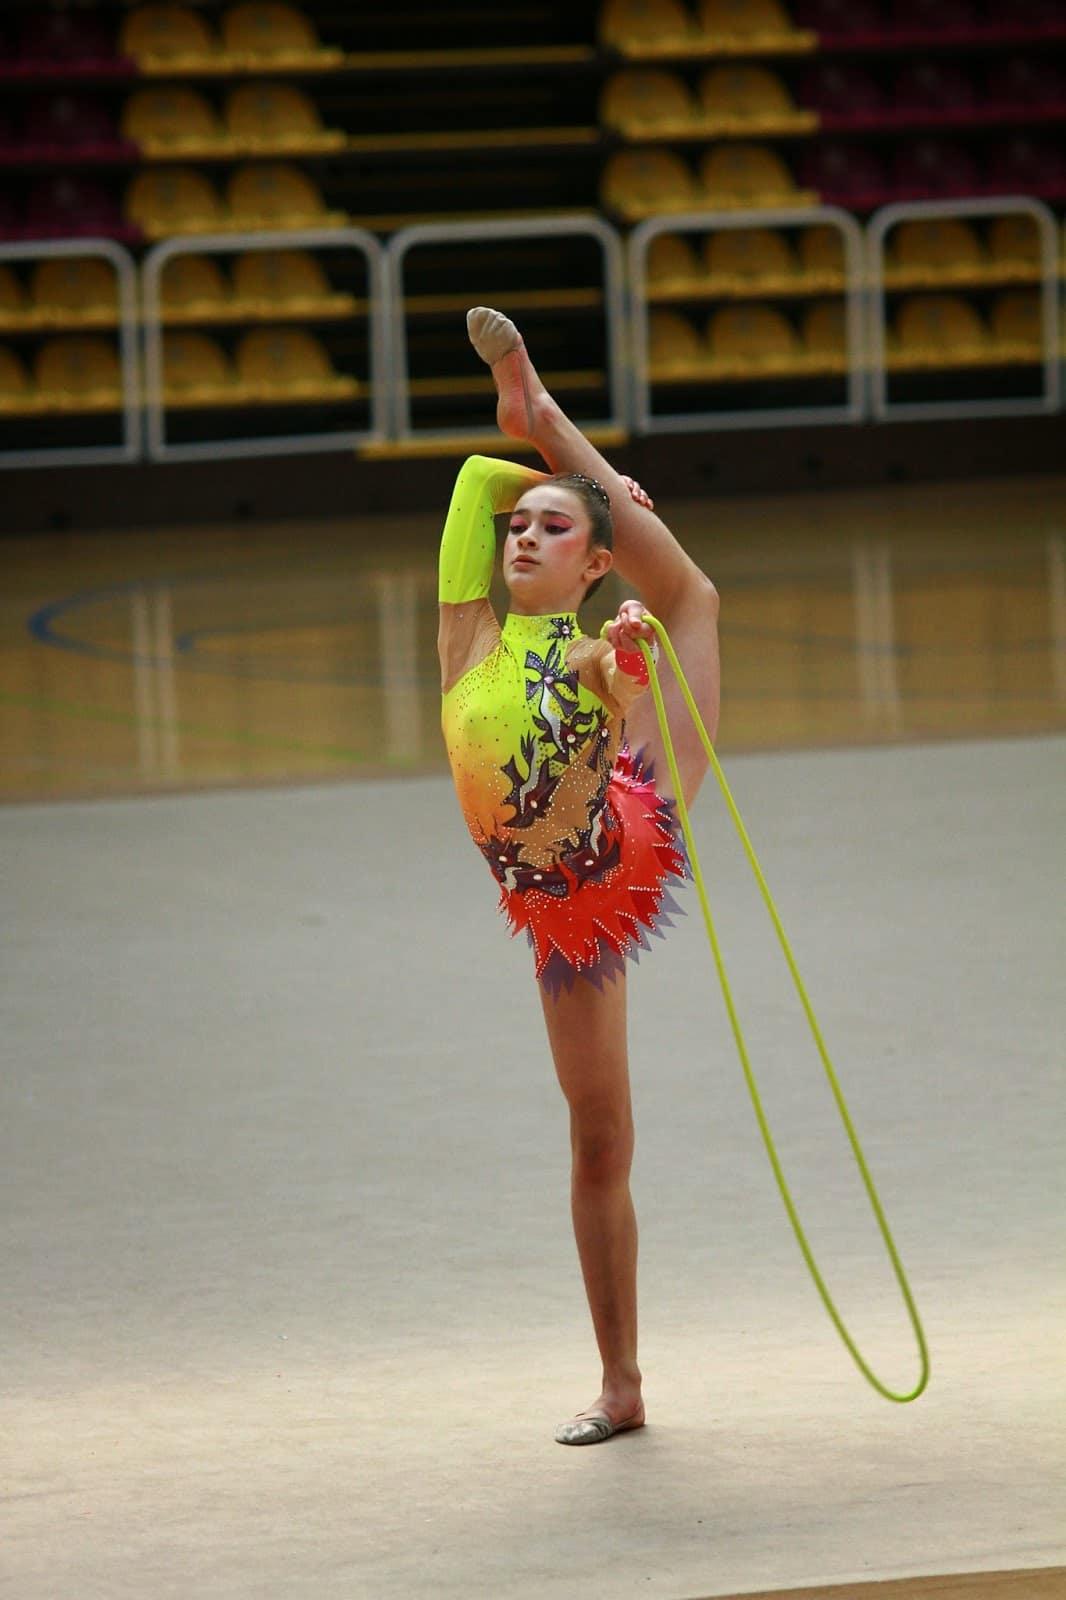 Cuerda-de-gimnasia-rítmica-3